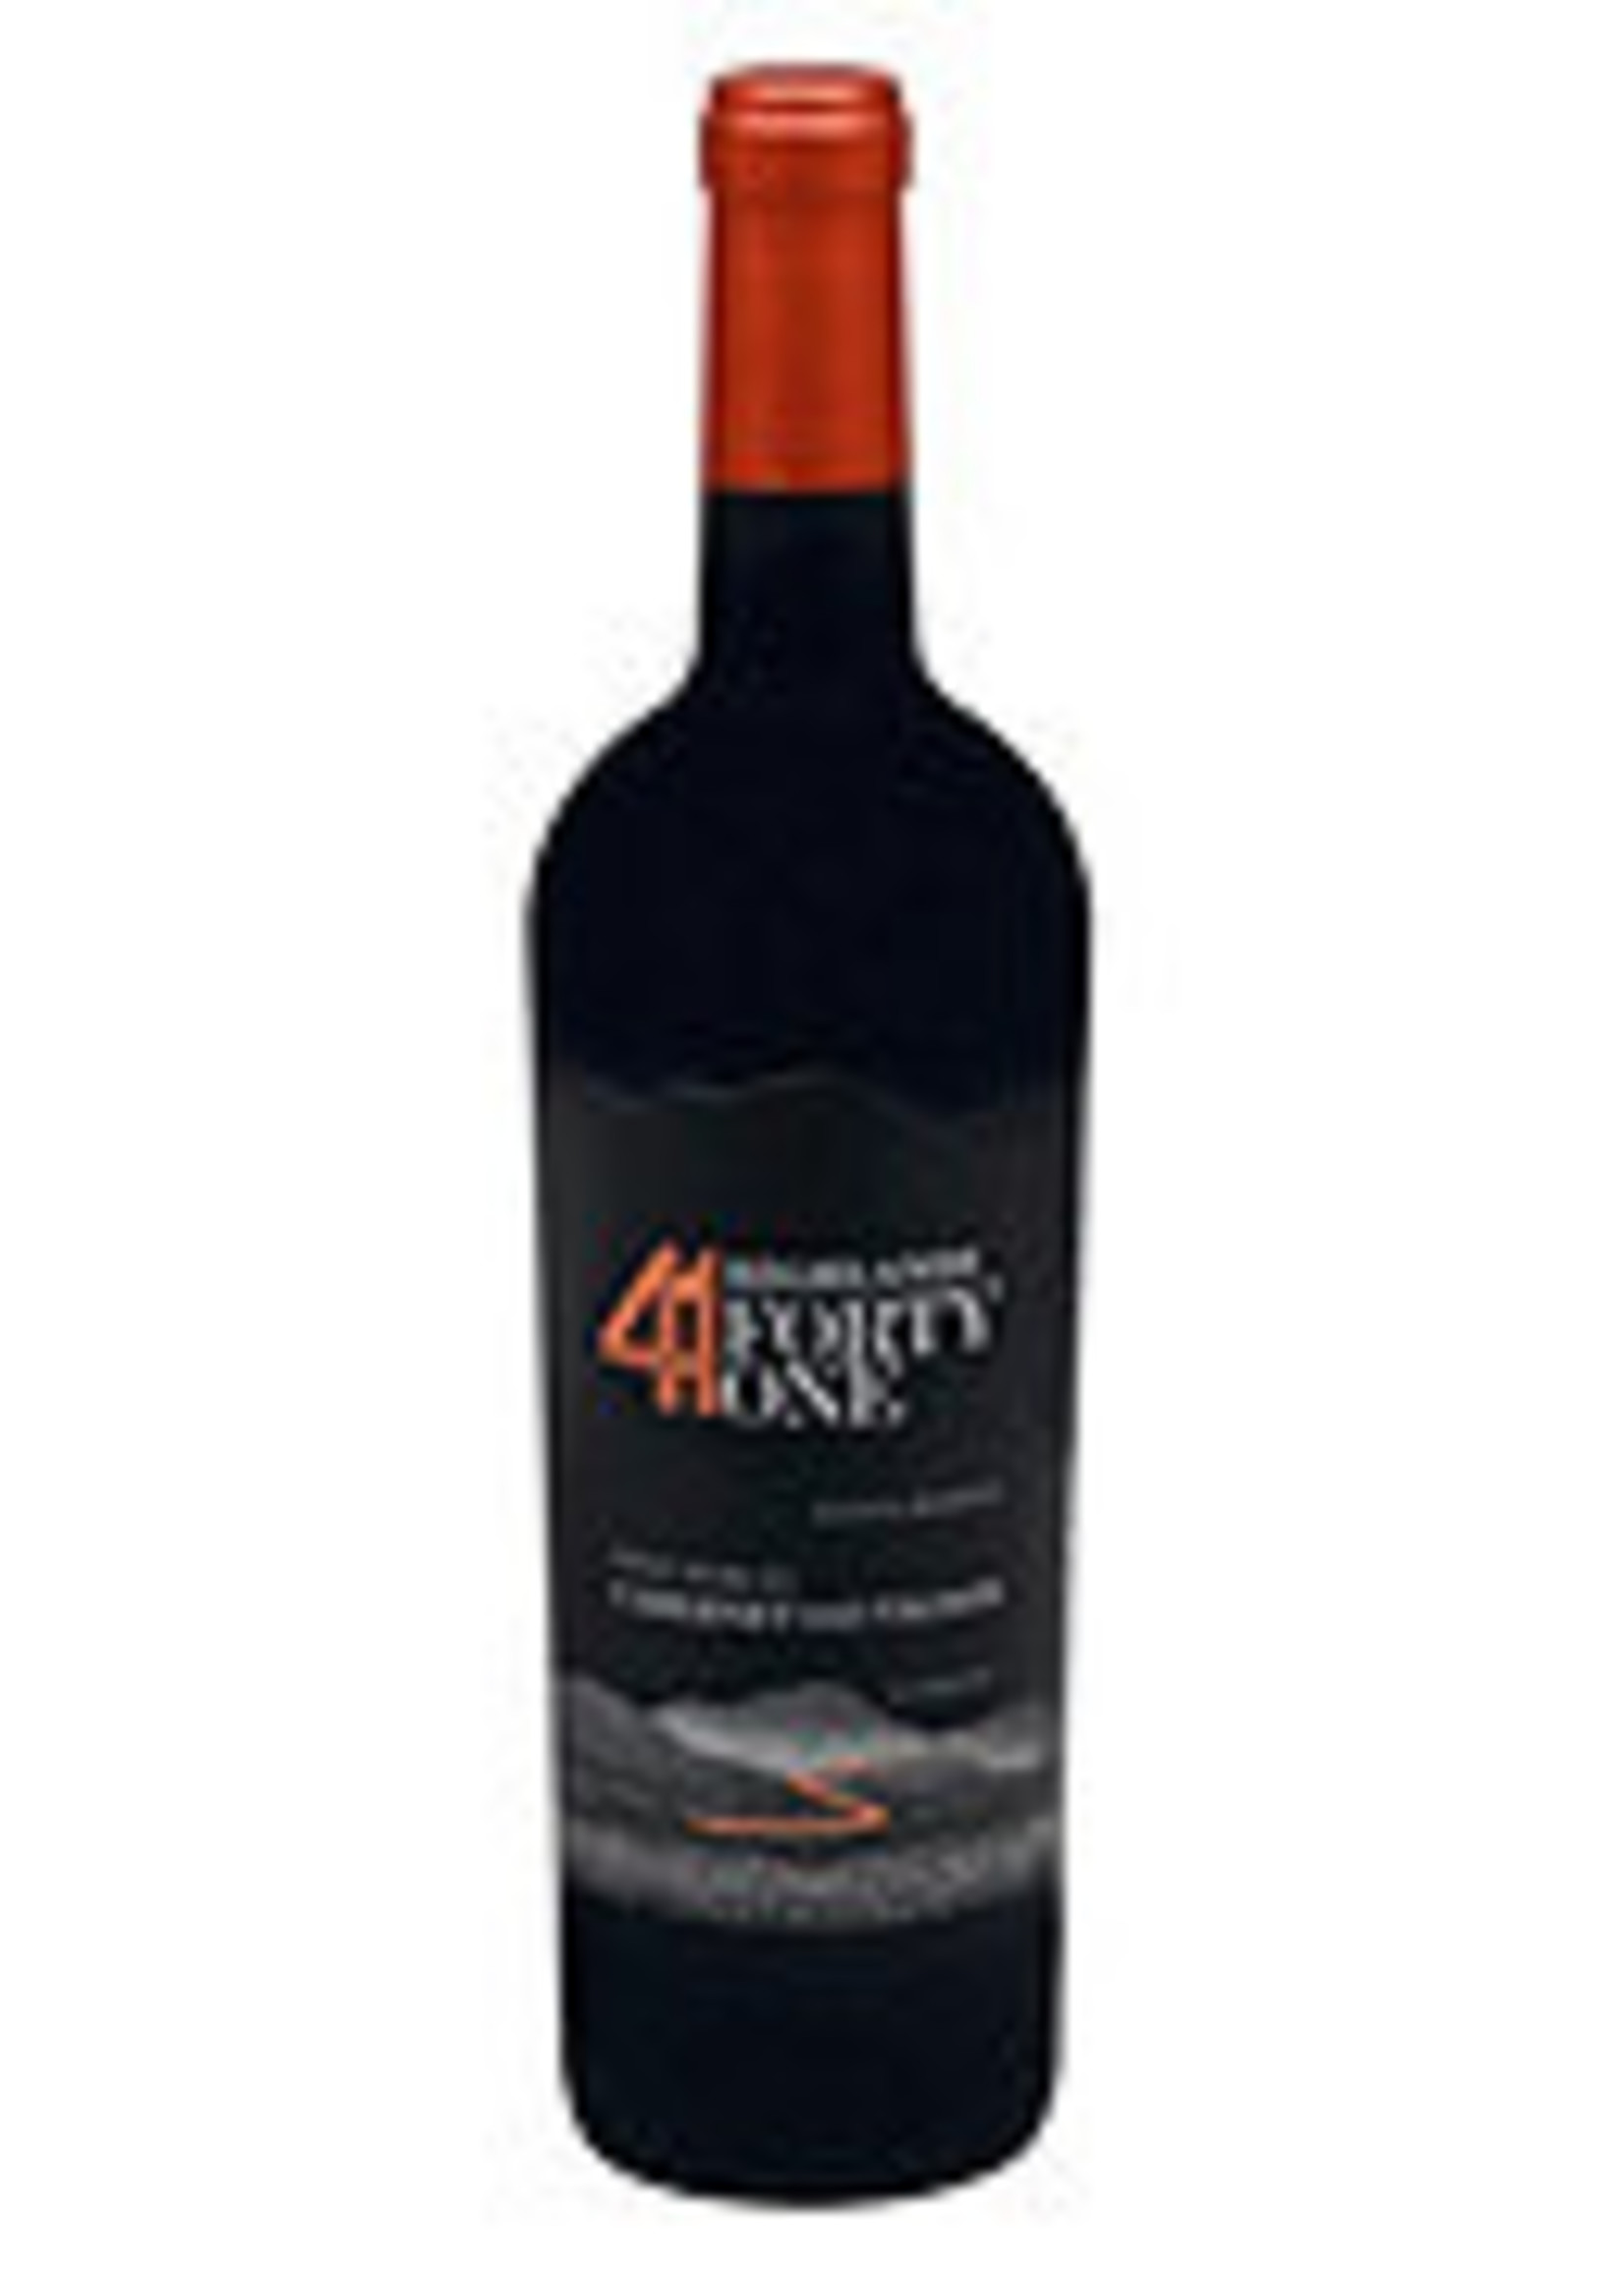 Highlands 41 Cabernet Sauvignon